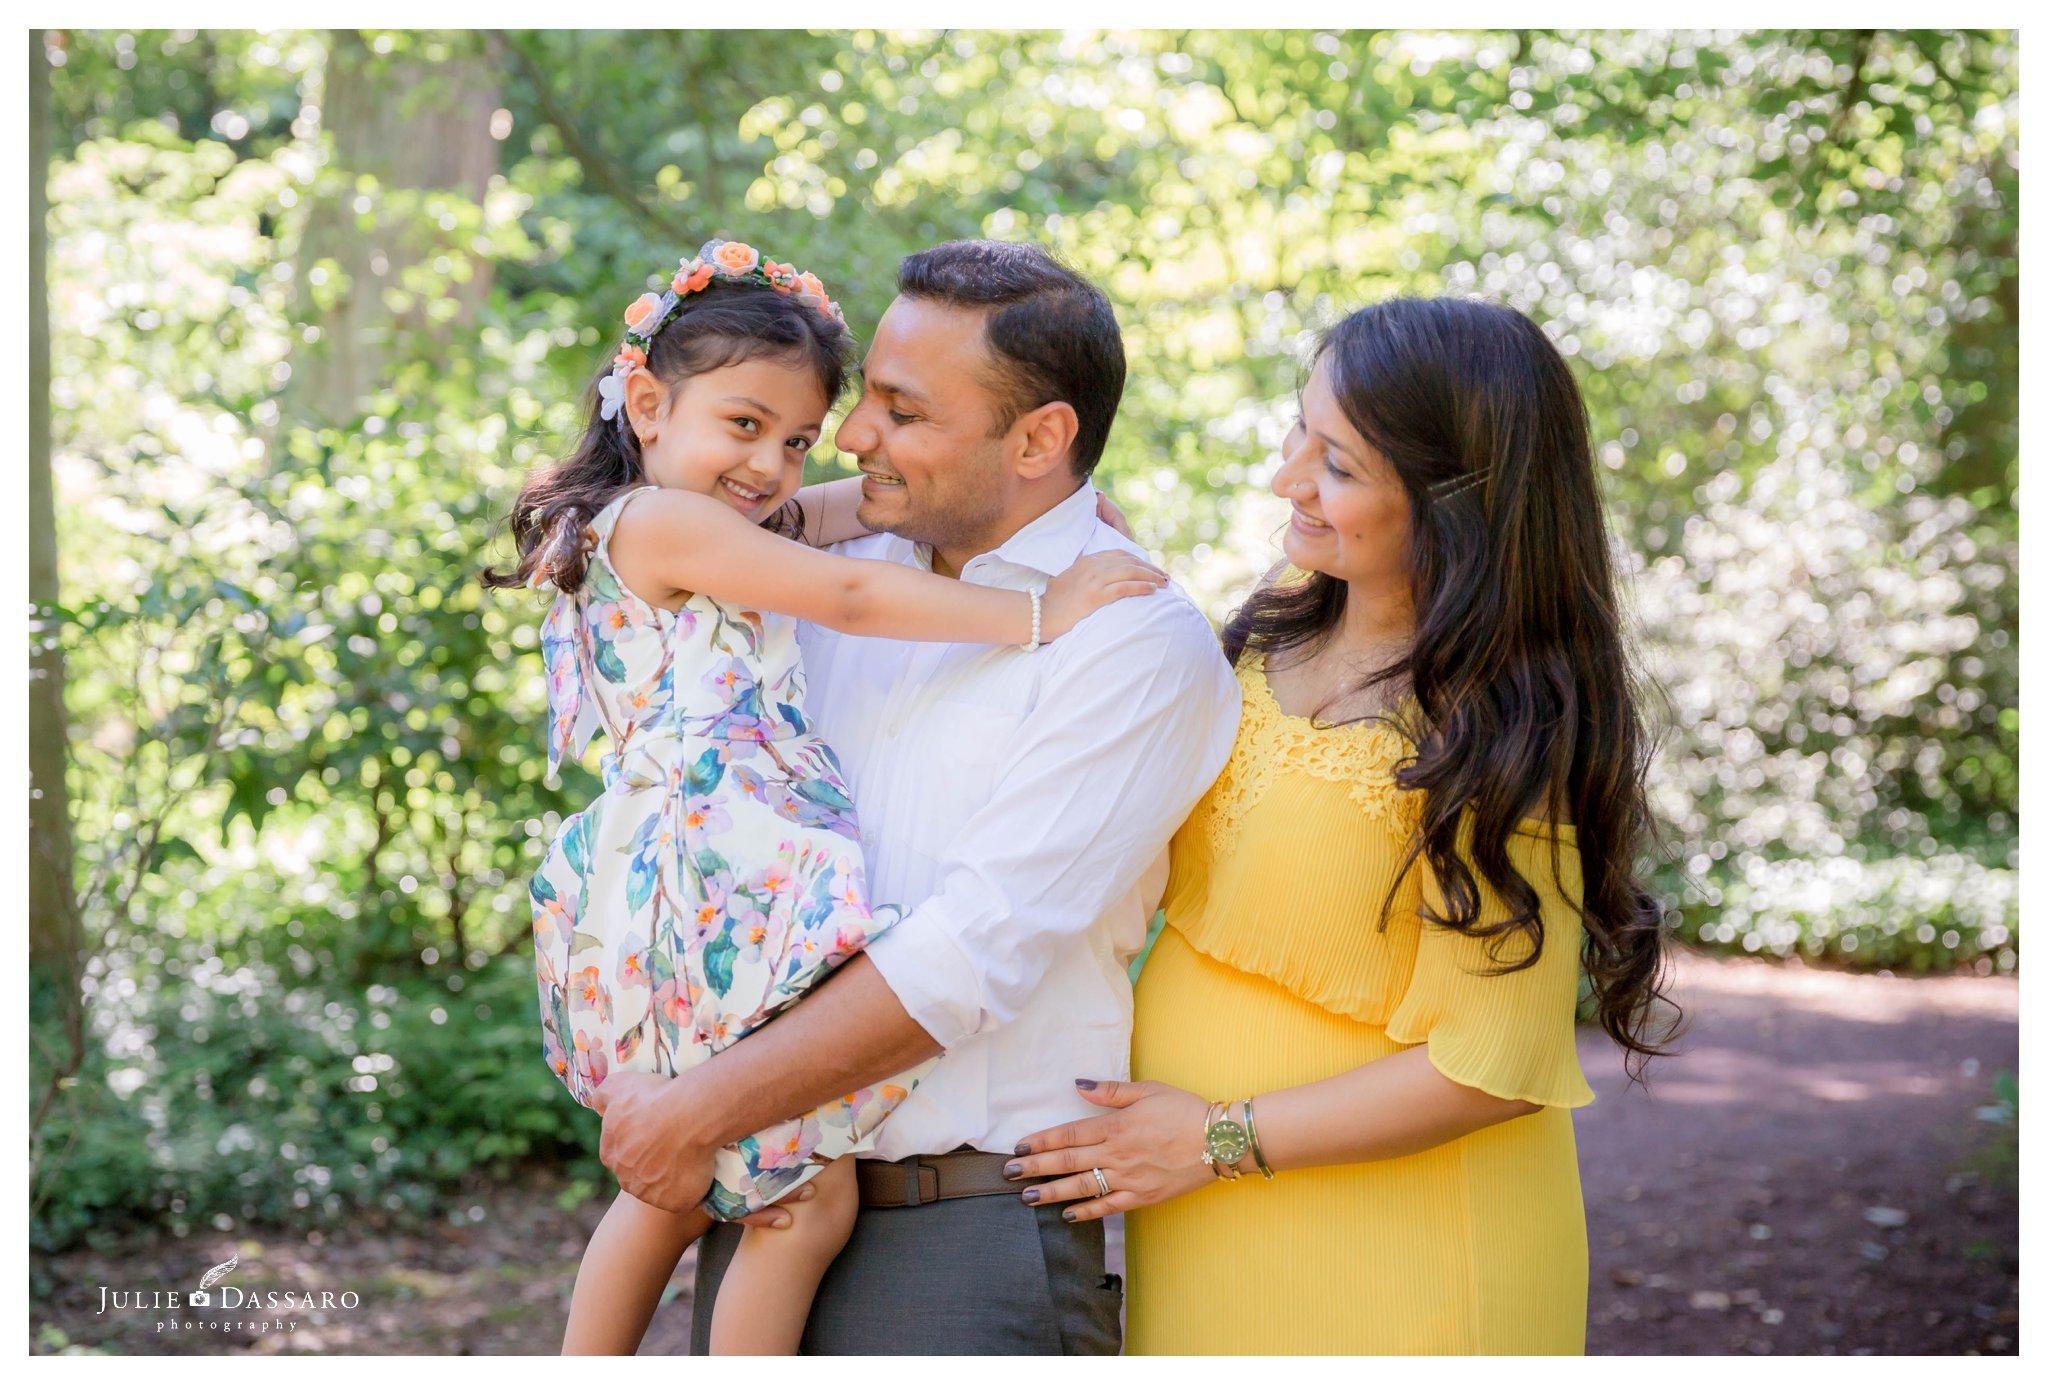 Local Photographer Princeton family portrait